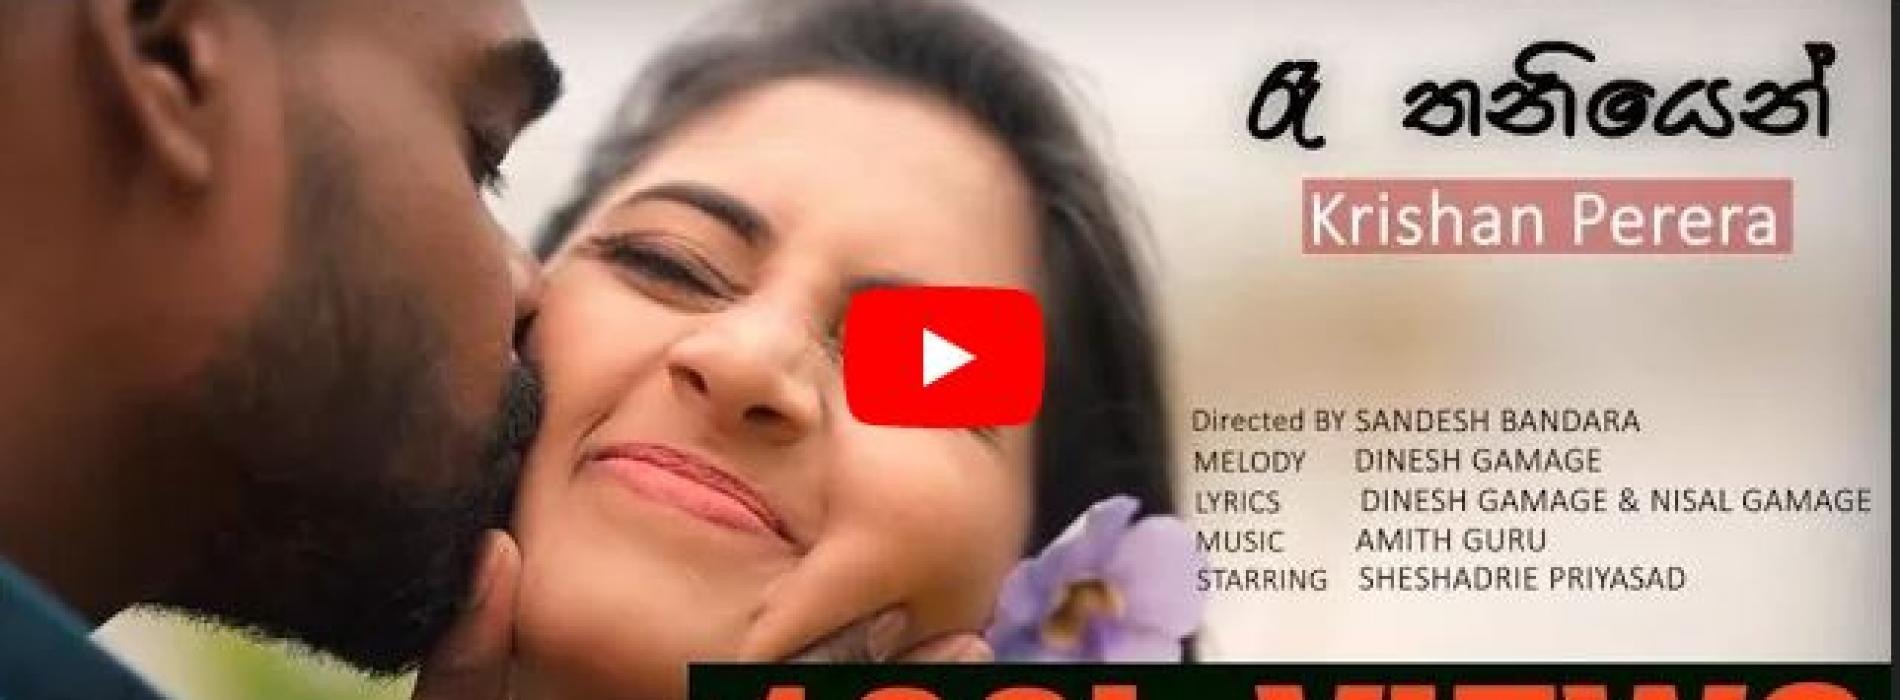 New Music : Krishan Perera | Re Thaniyen (රෑ තනියෙන්) | Official Music Video